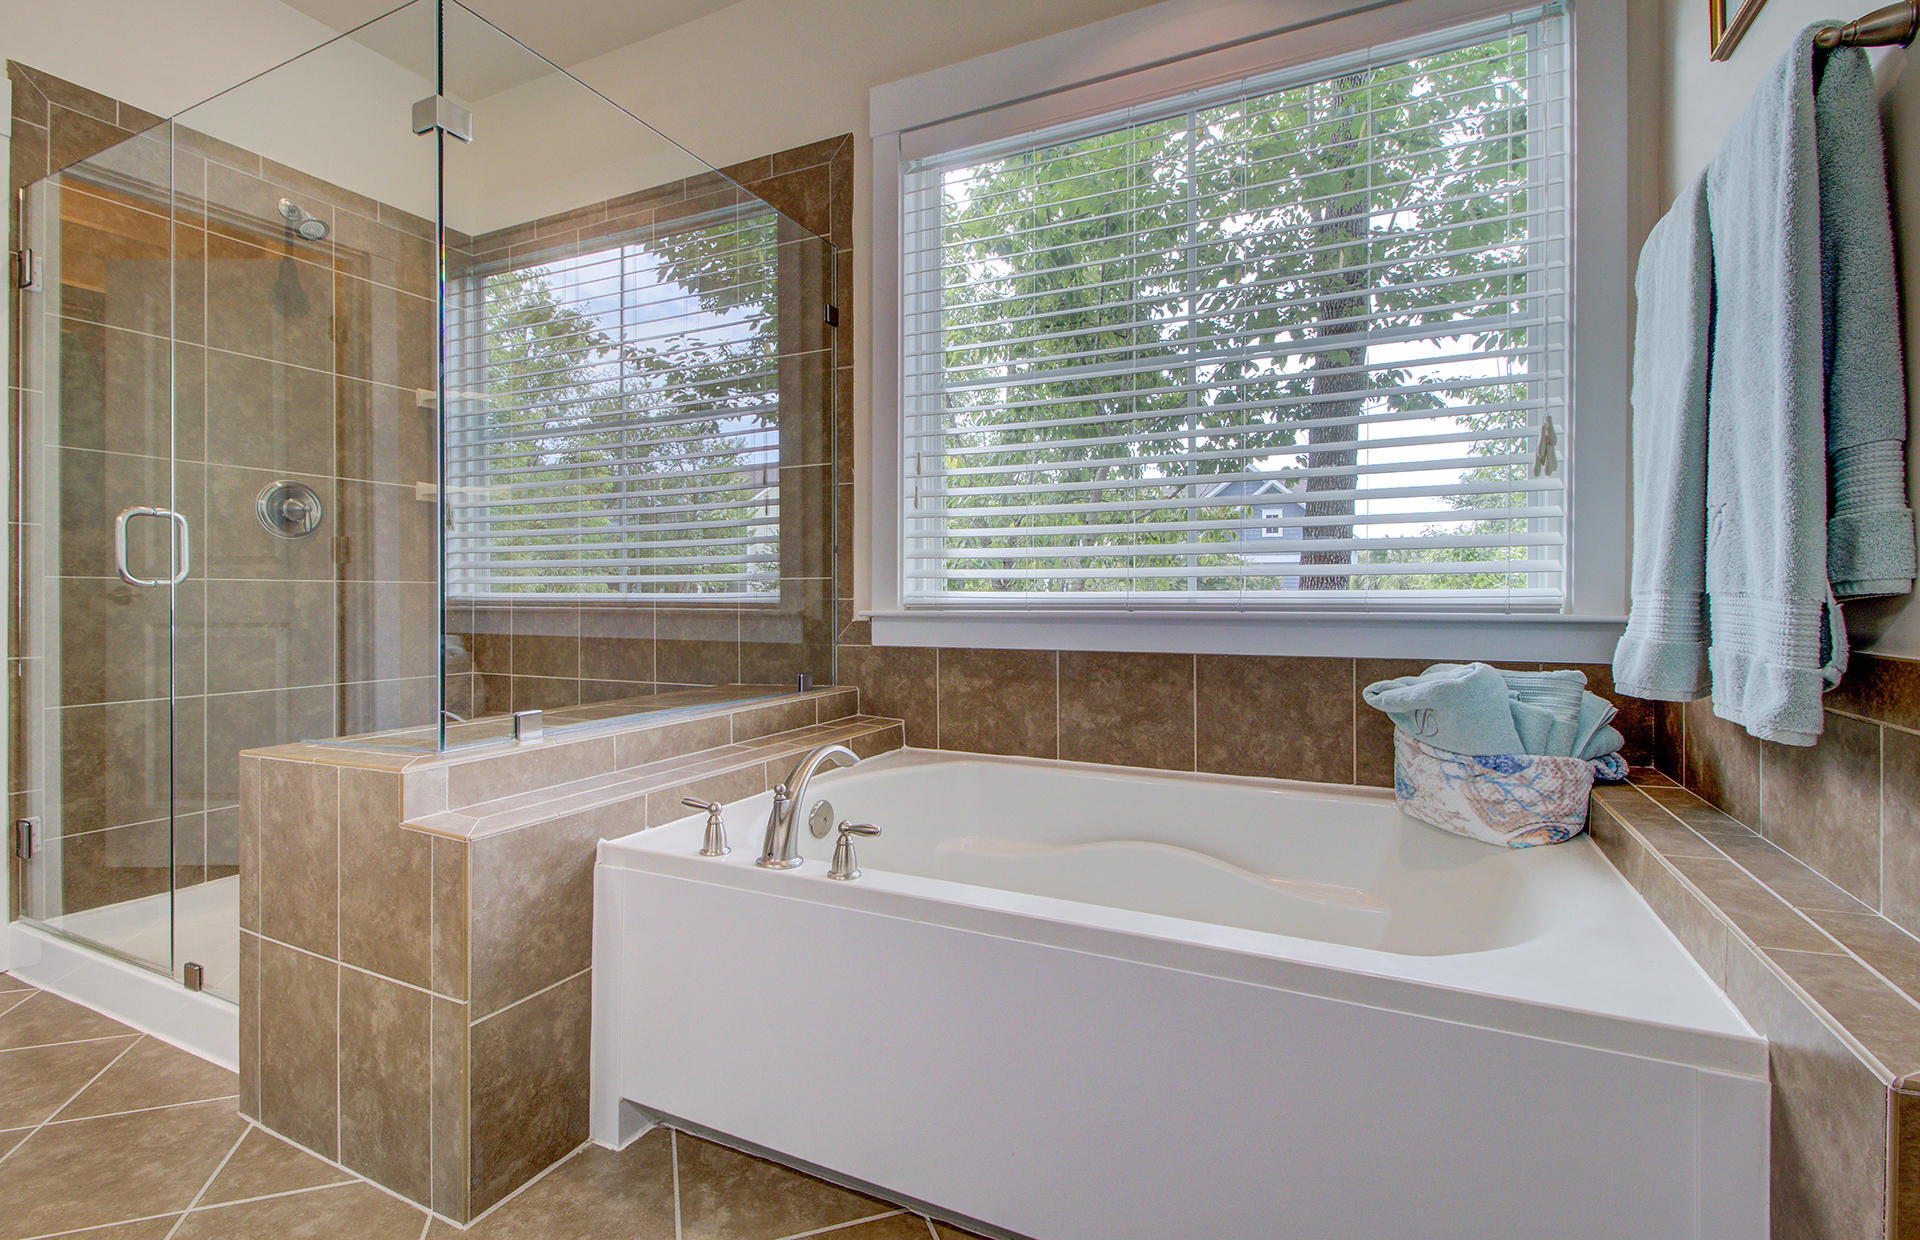 Scotts Creek Homes For Sale - 1404 Scotts Creek, Mount Pleasant, SC - 44